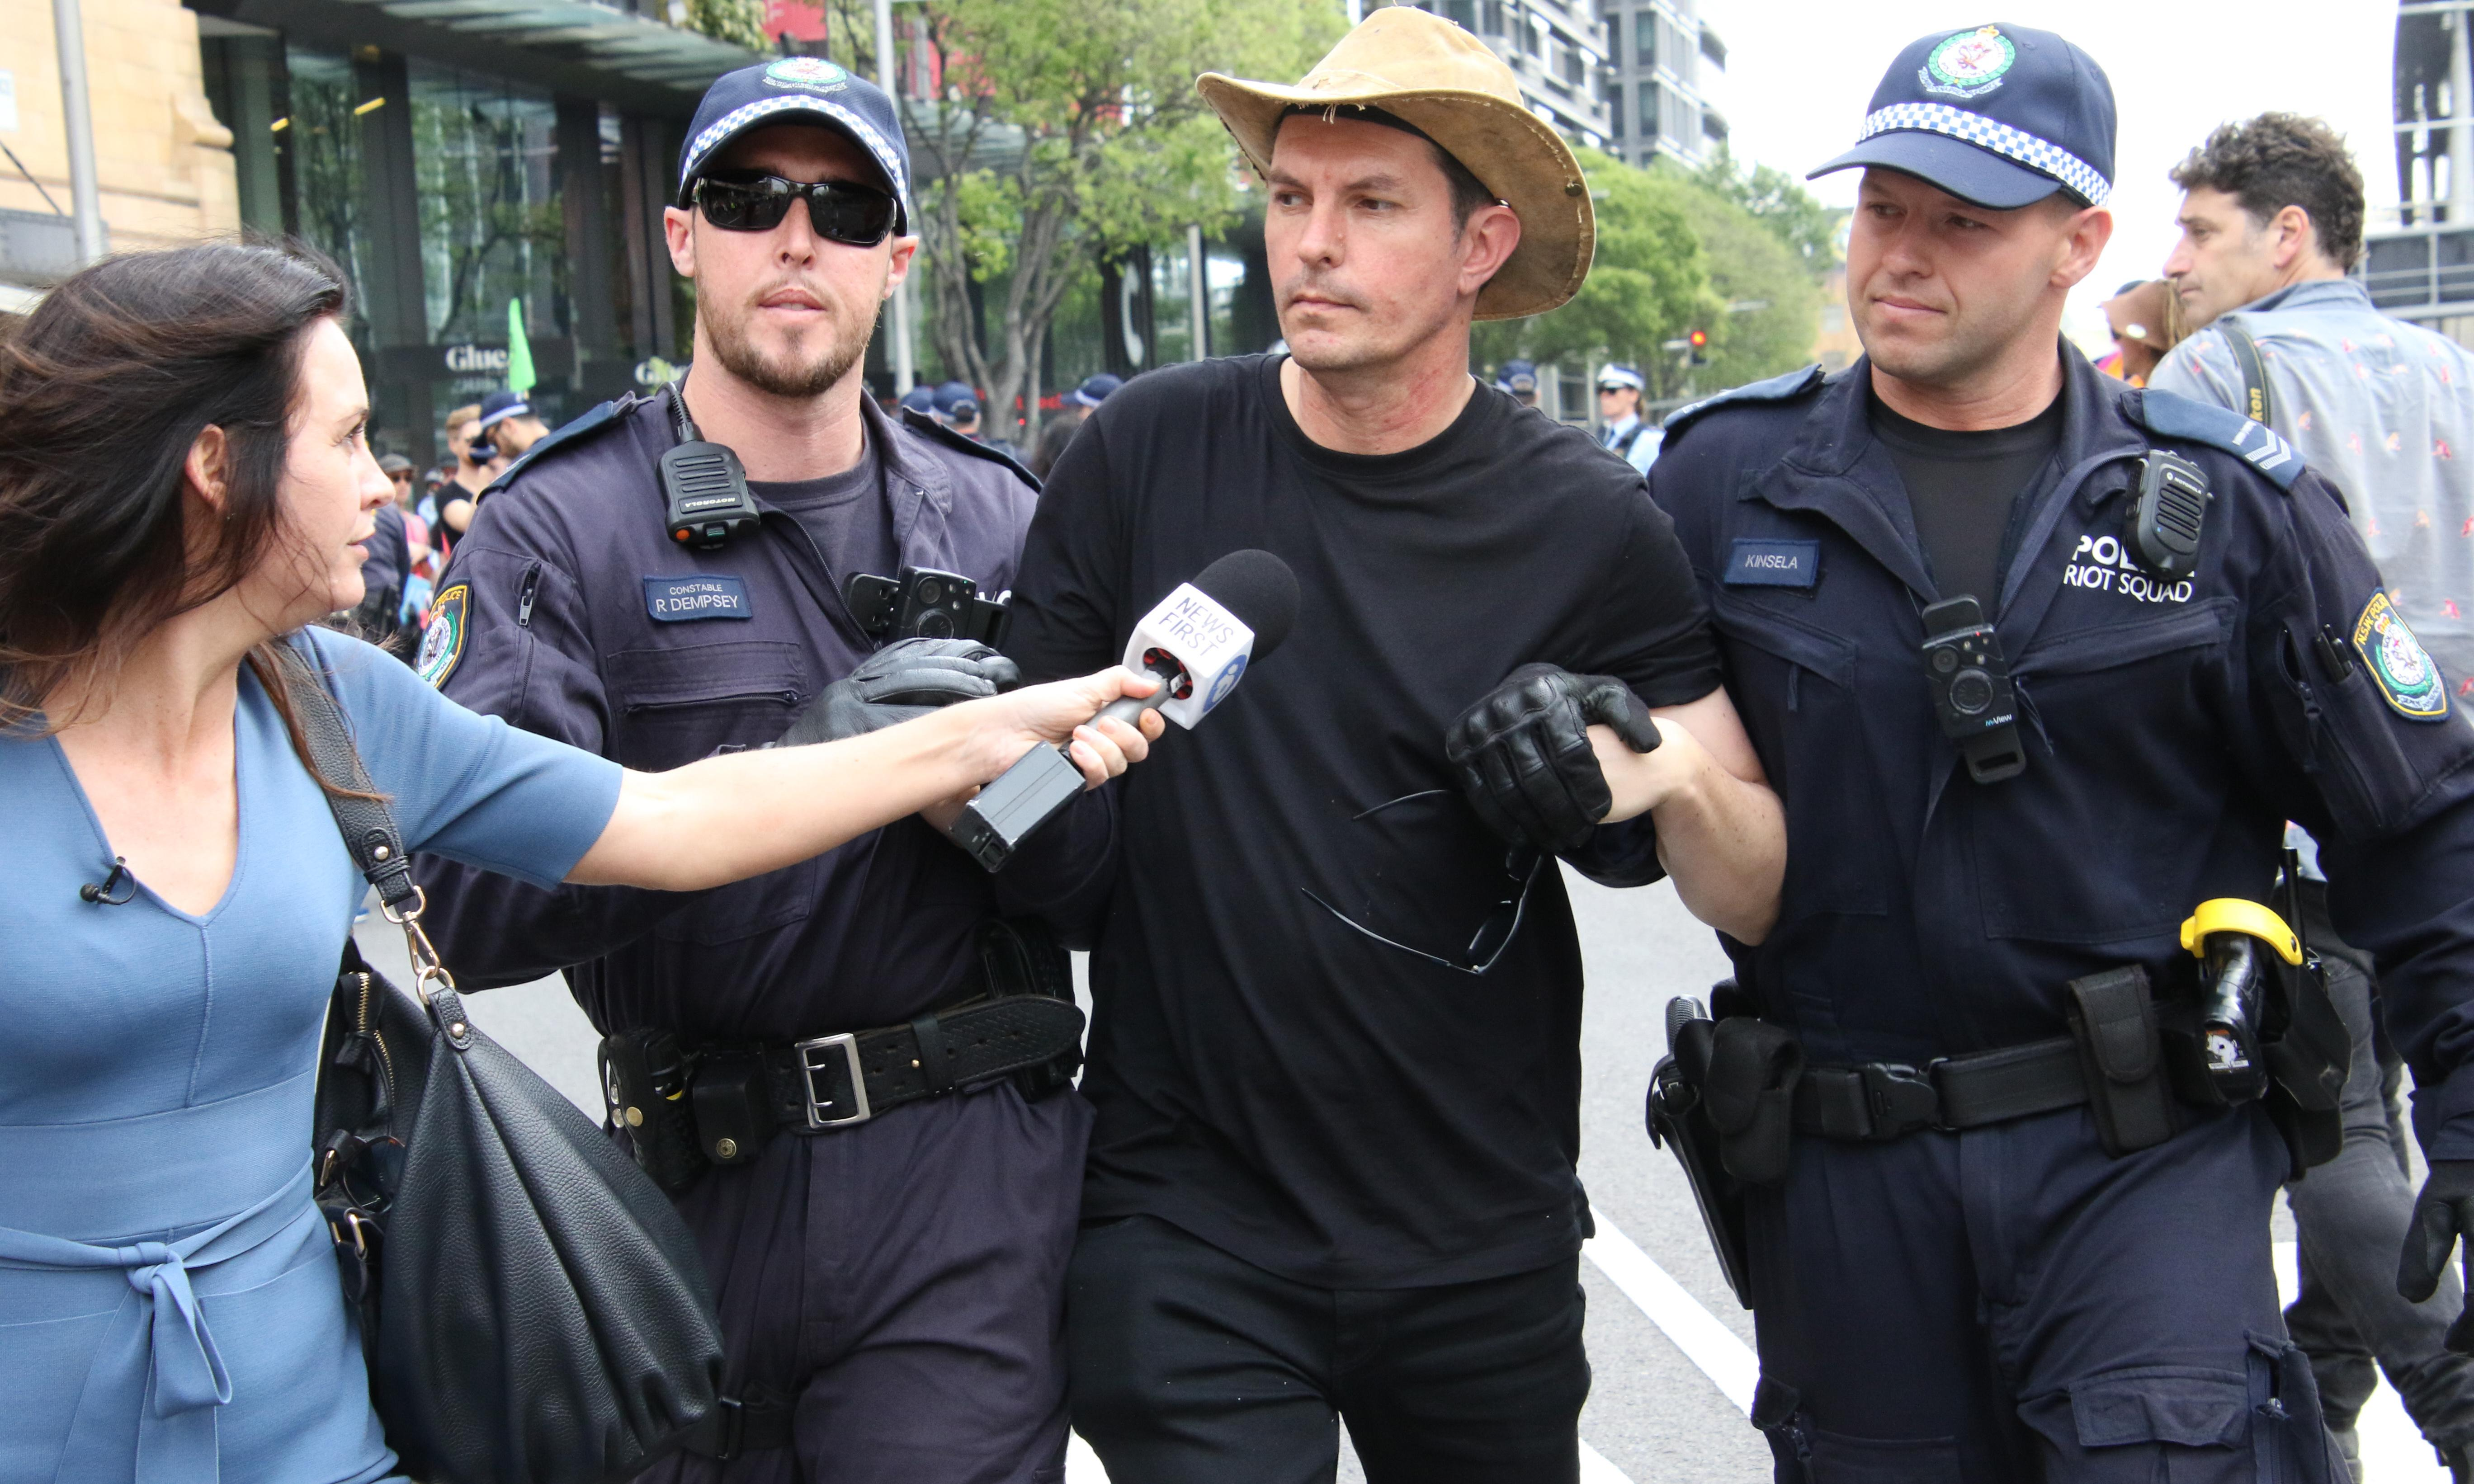 Extinction Rebellion: Scott Ludlam has 'absurd' bail conditions dismissed by judge